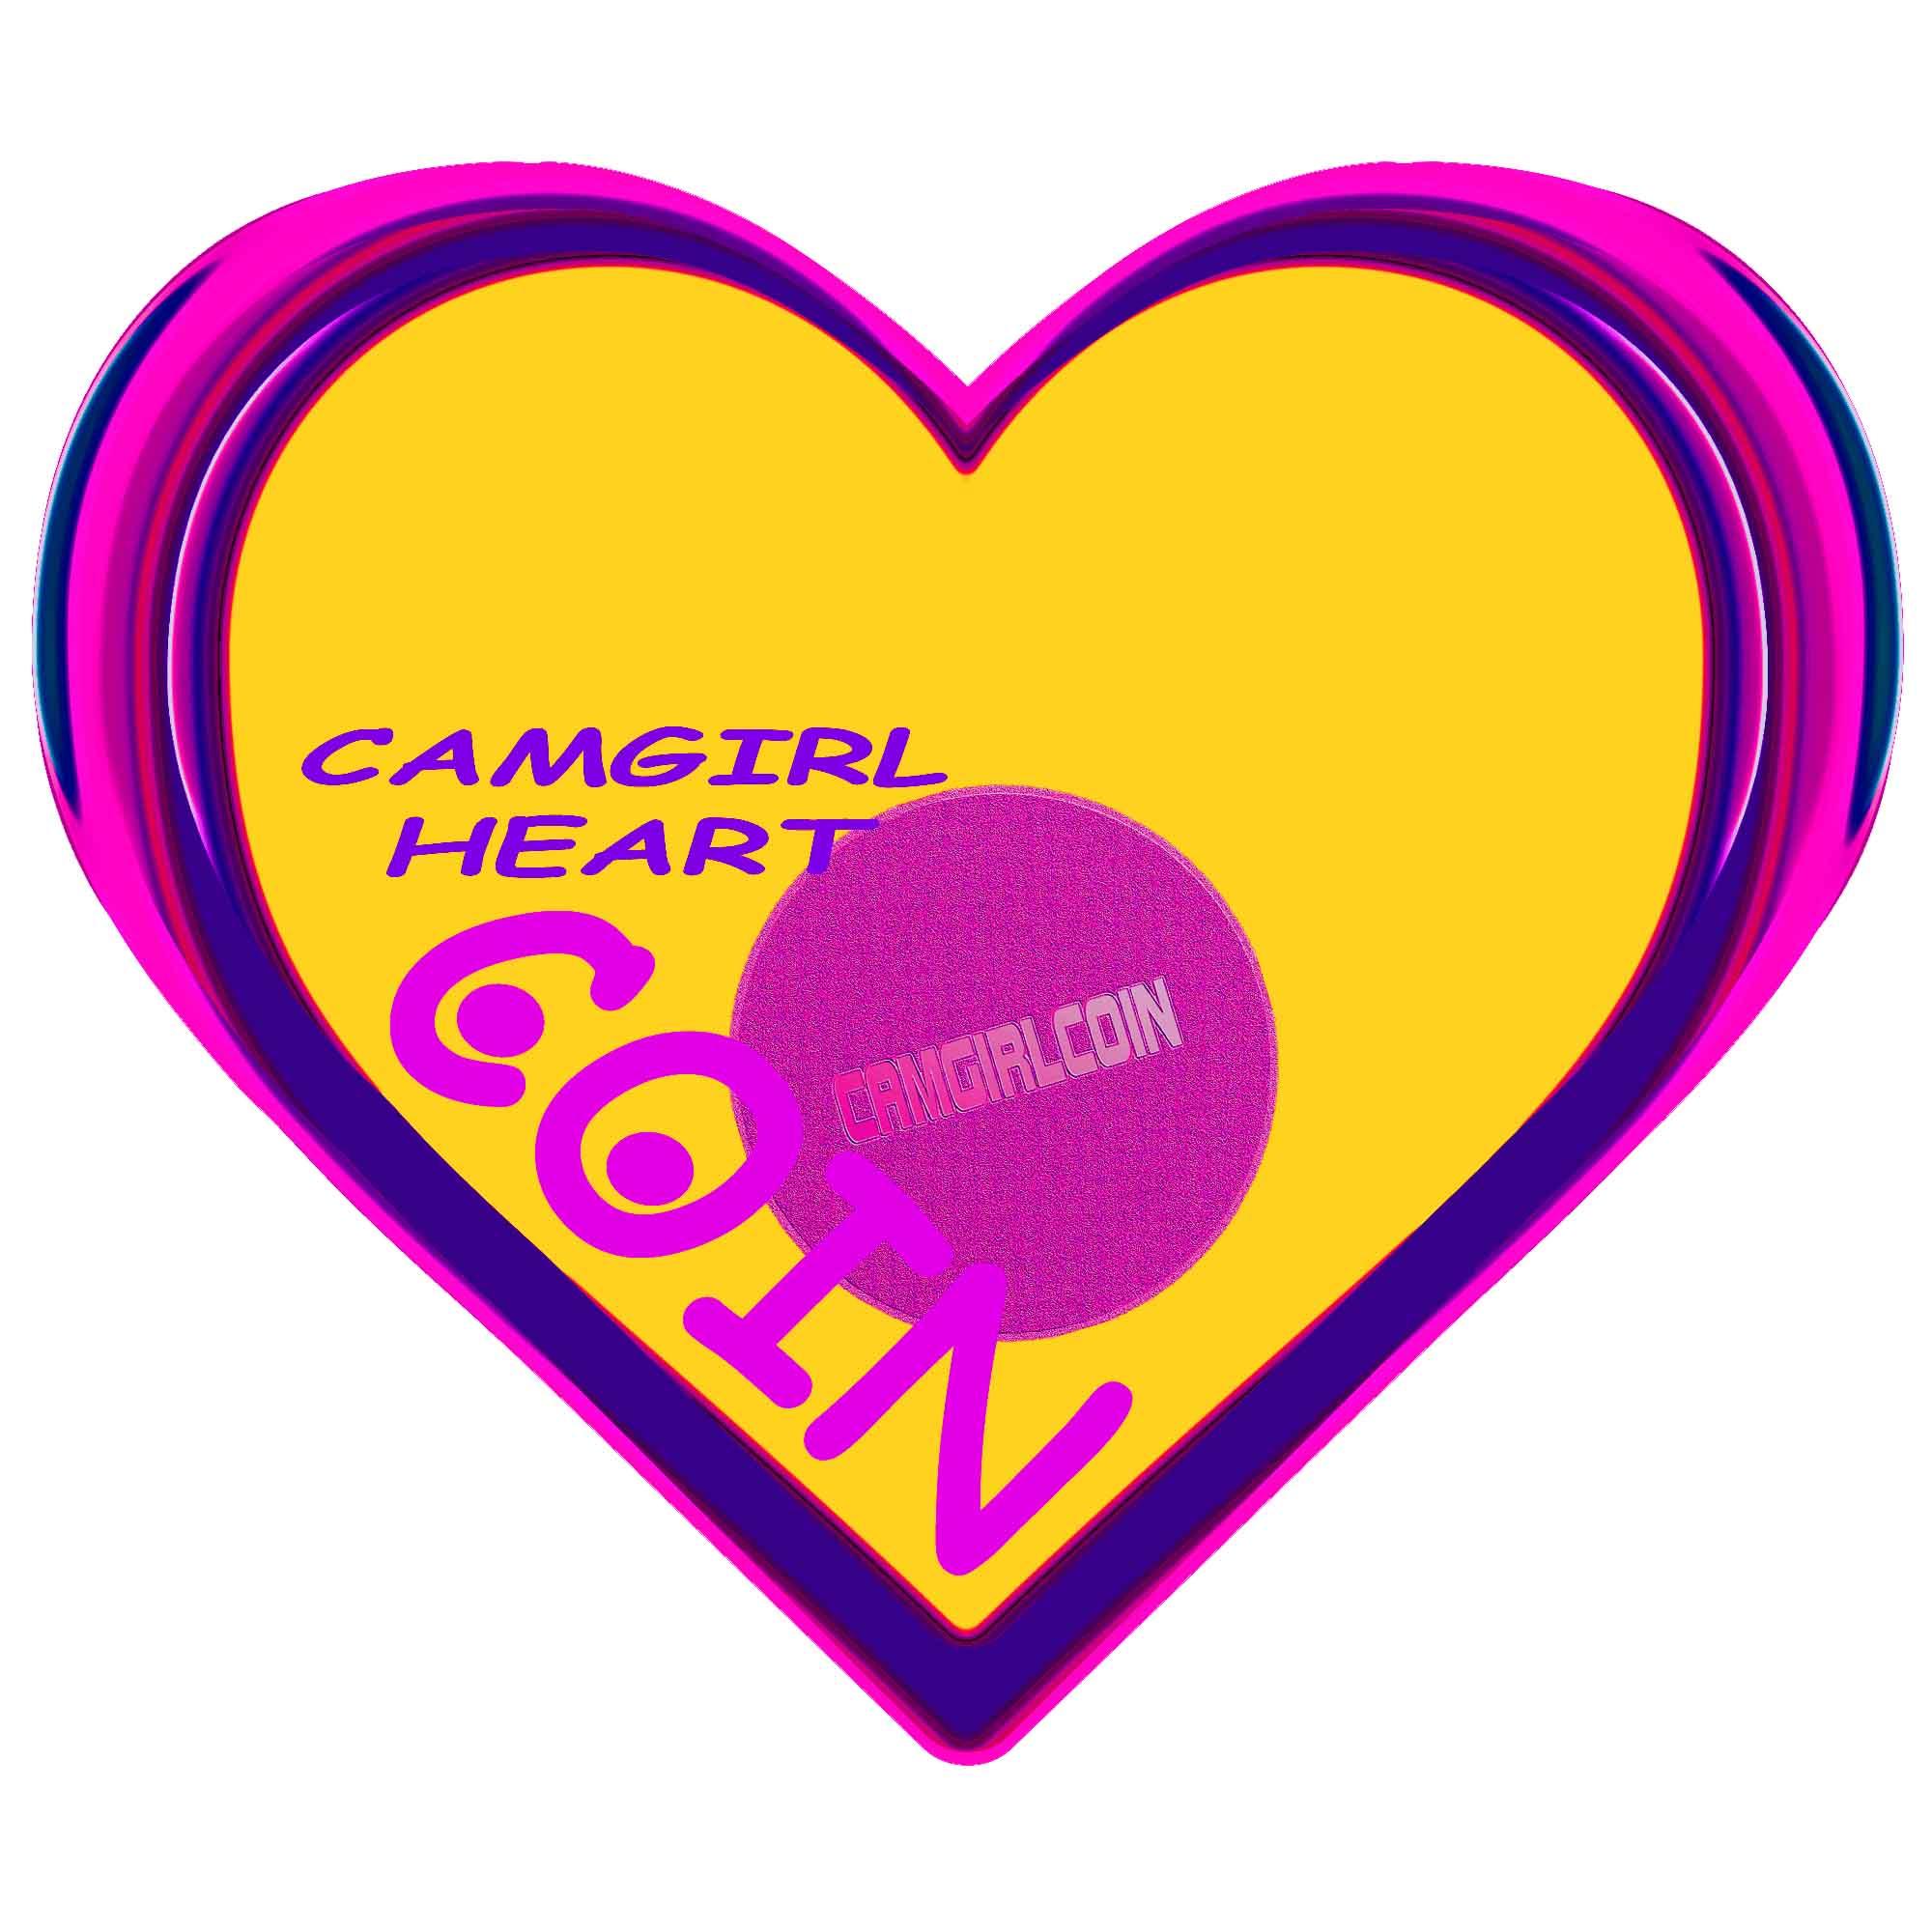 2000px-Heart coinnngl jkjkgg camgirlcoin ds.jpg